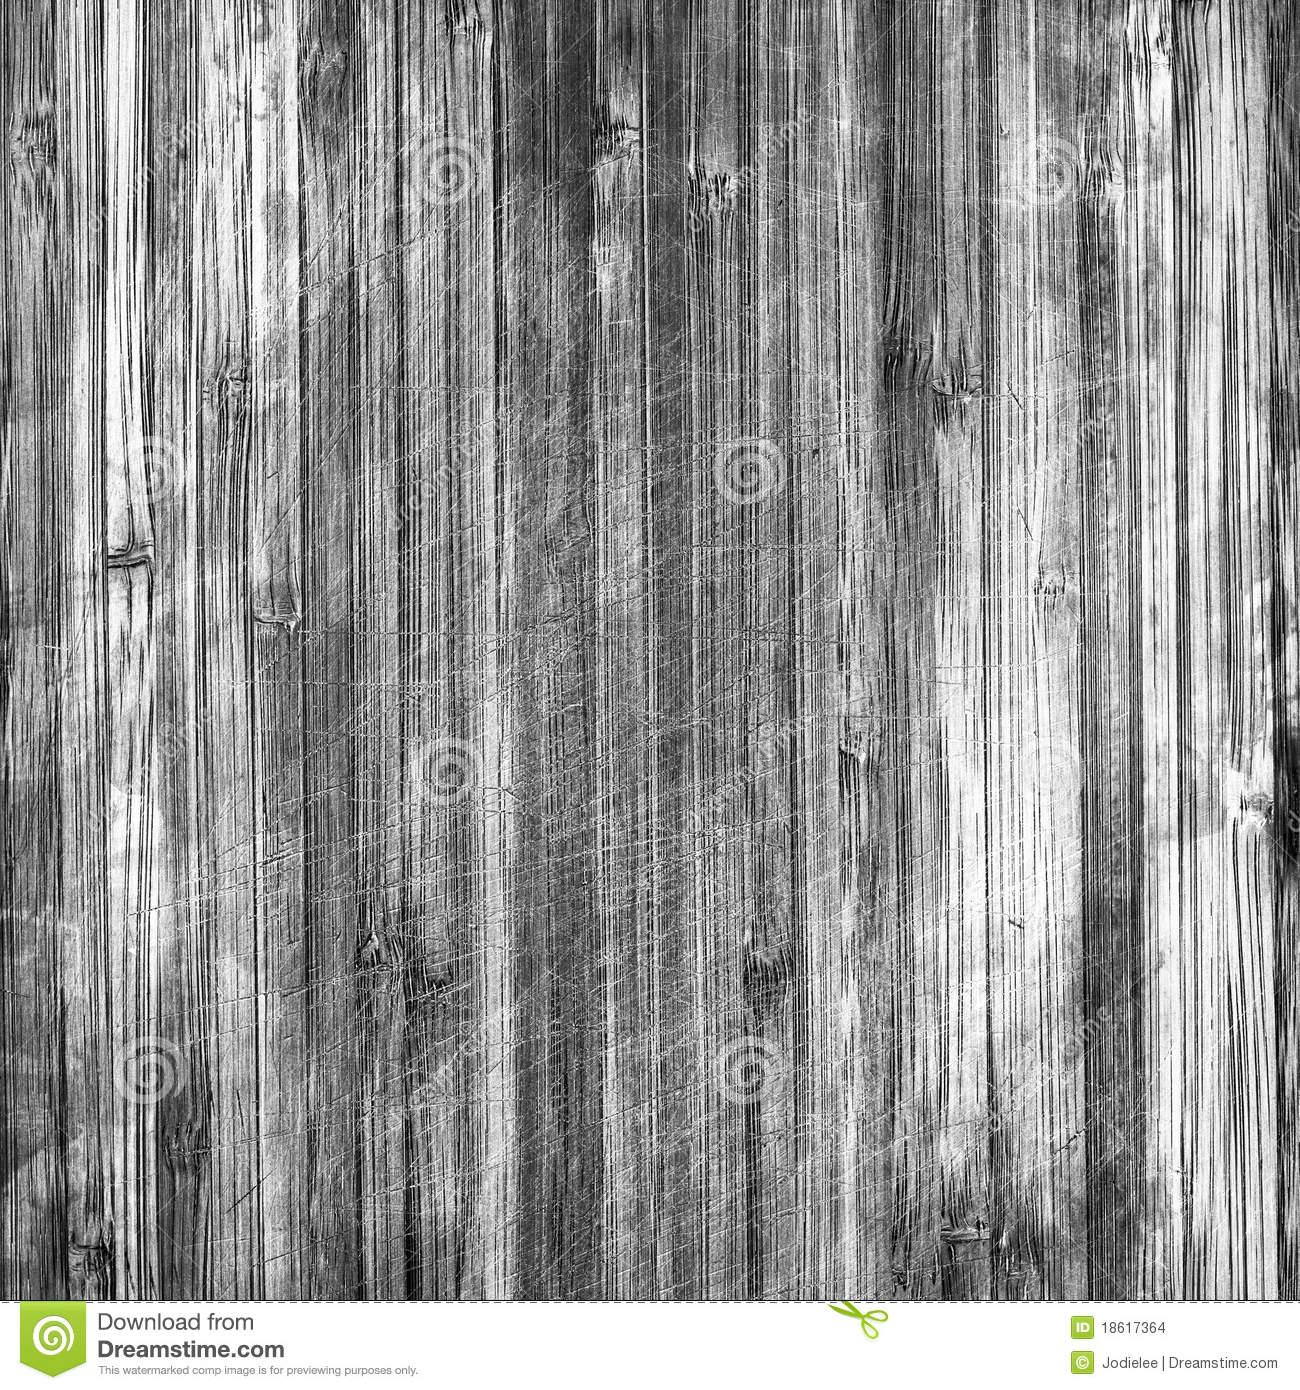 Black White Wood Grain Clipart - Clipart Kid